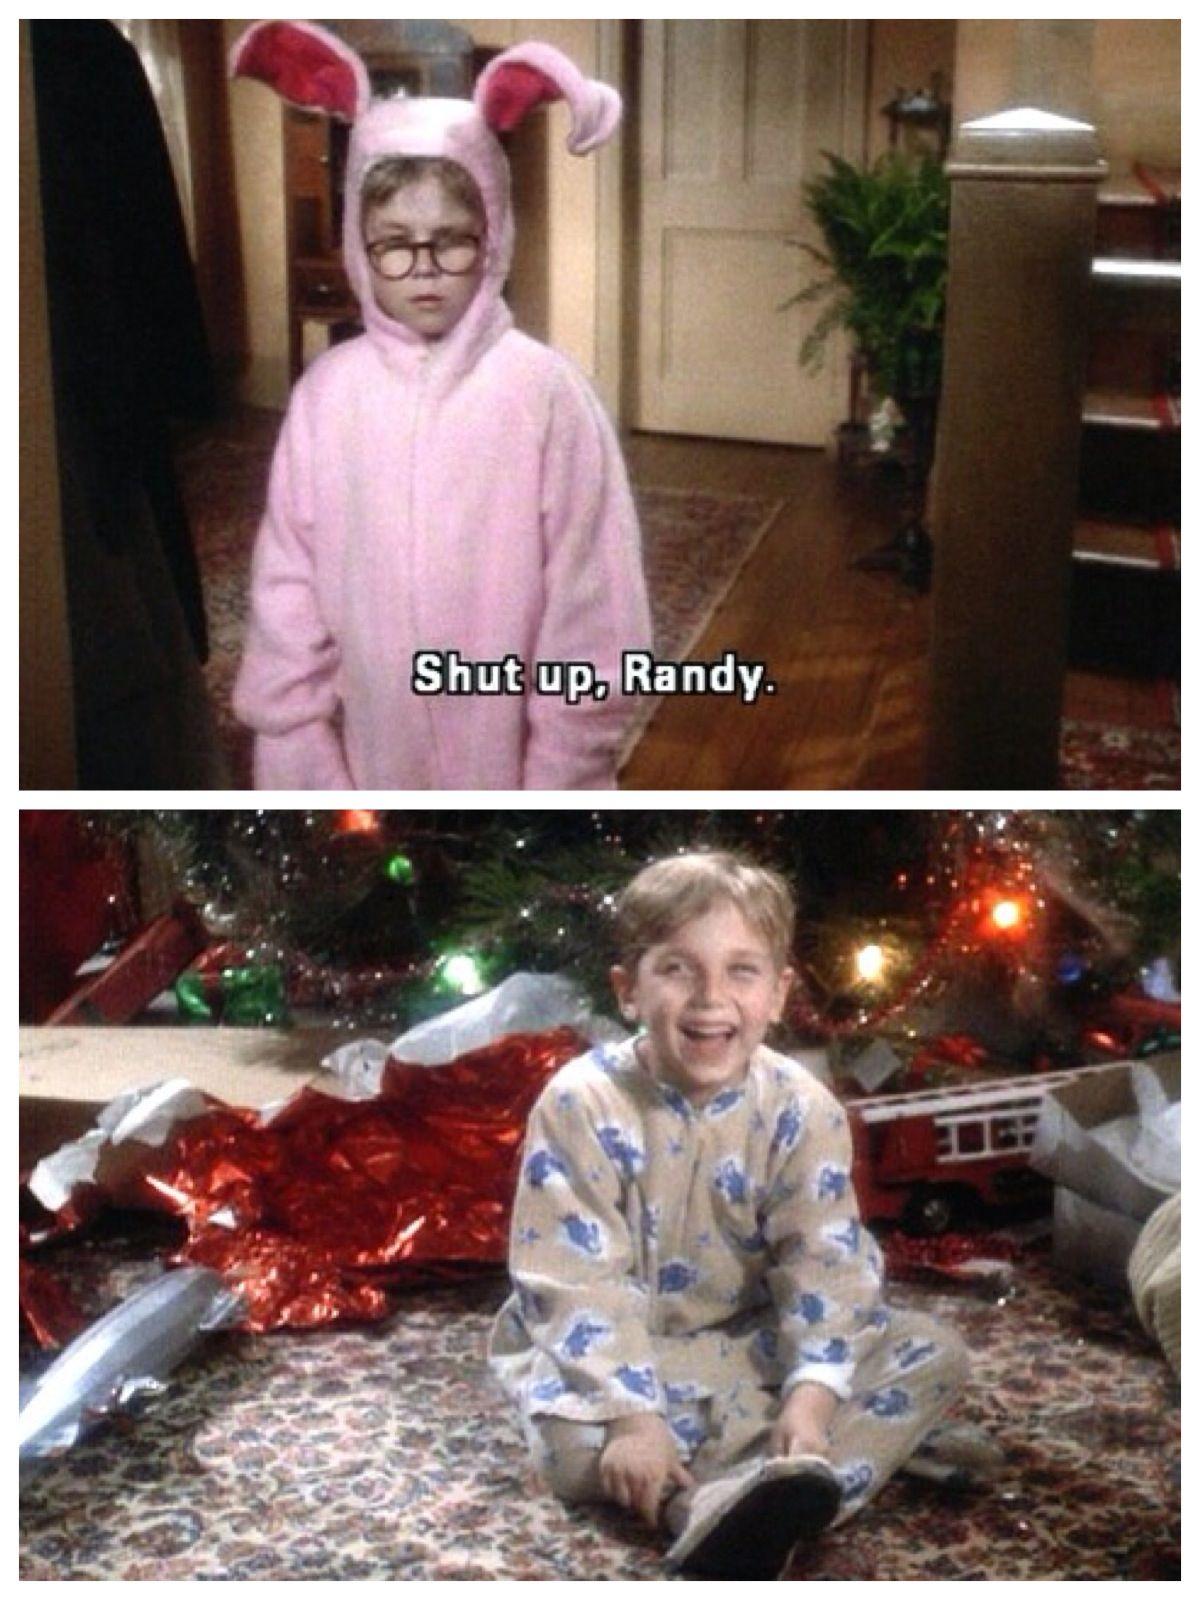 Randy Christmas Story.Brother Laughing At Ralph Shut Up Randy Christmas A